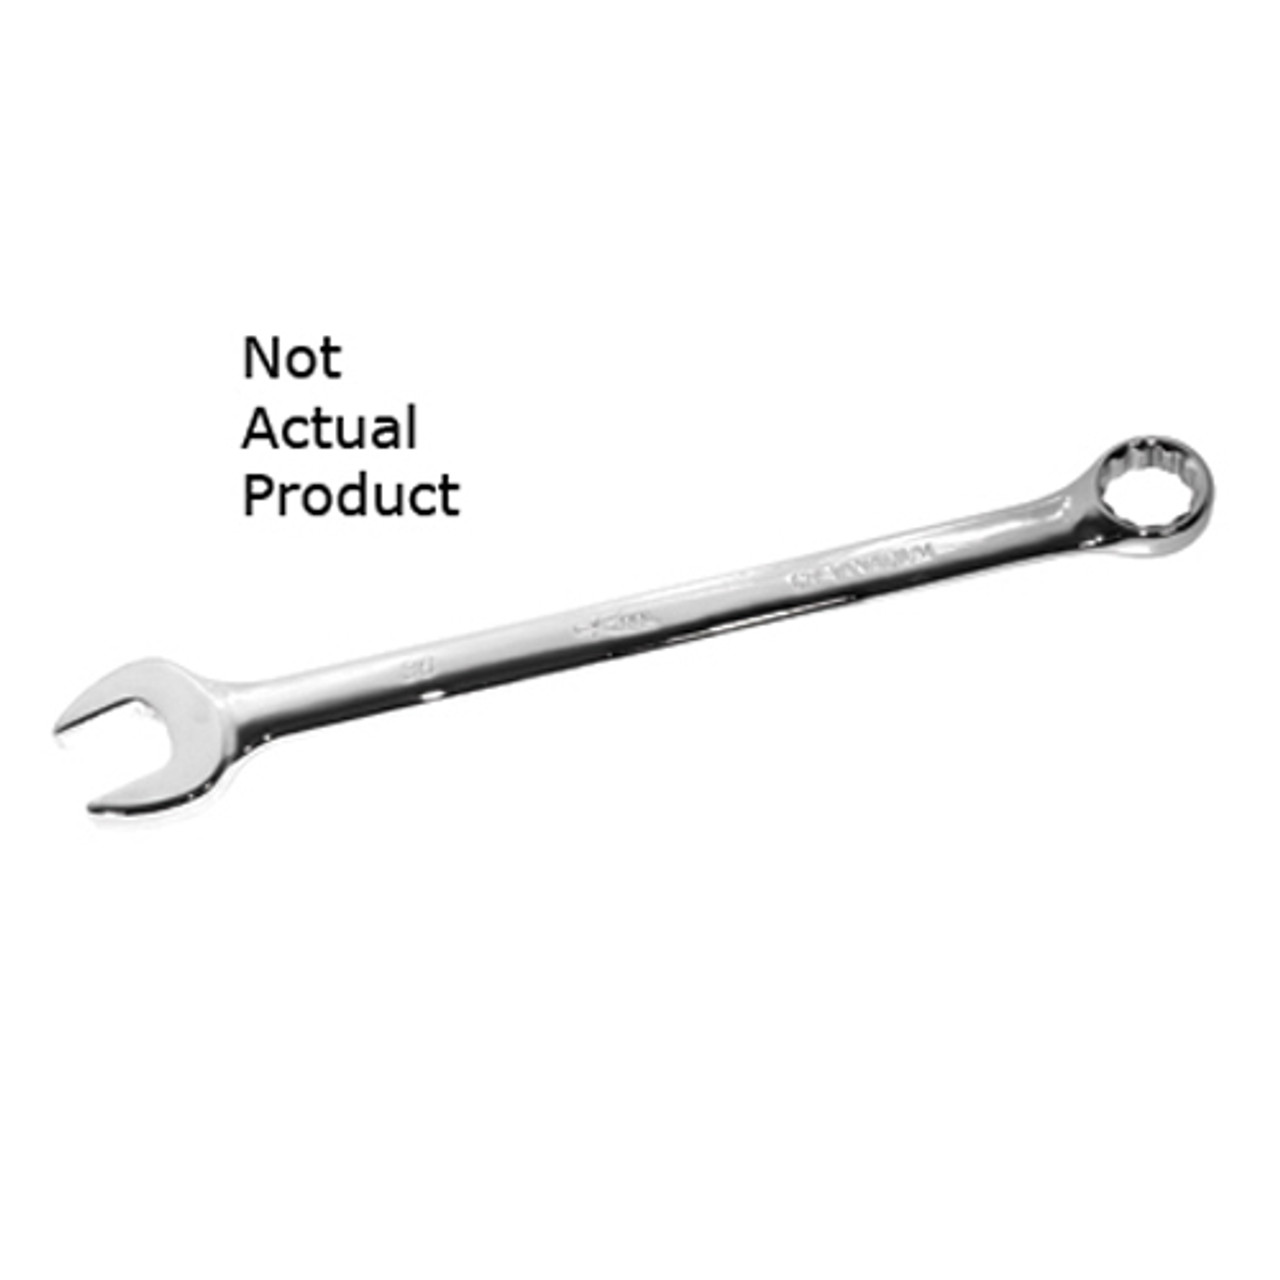 KTI KTI-41824 Combination Wrench